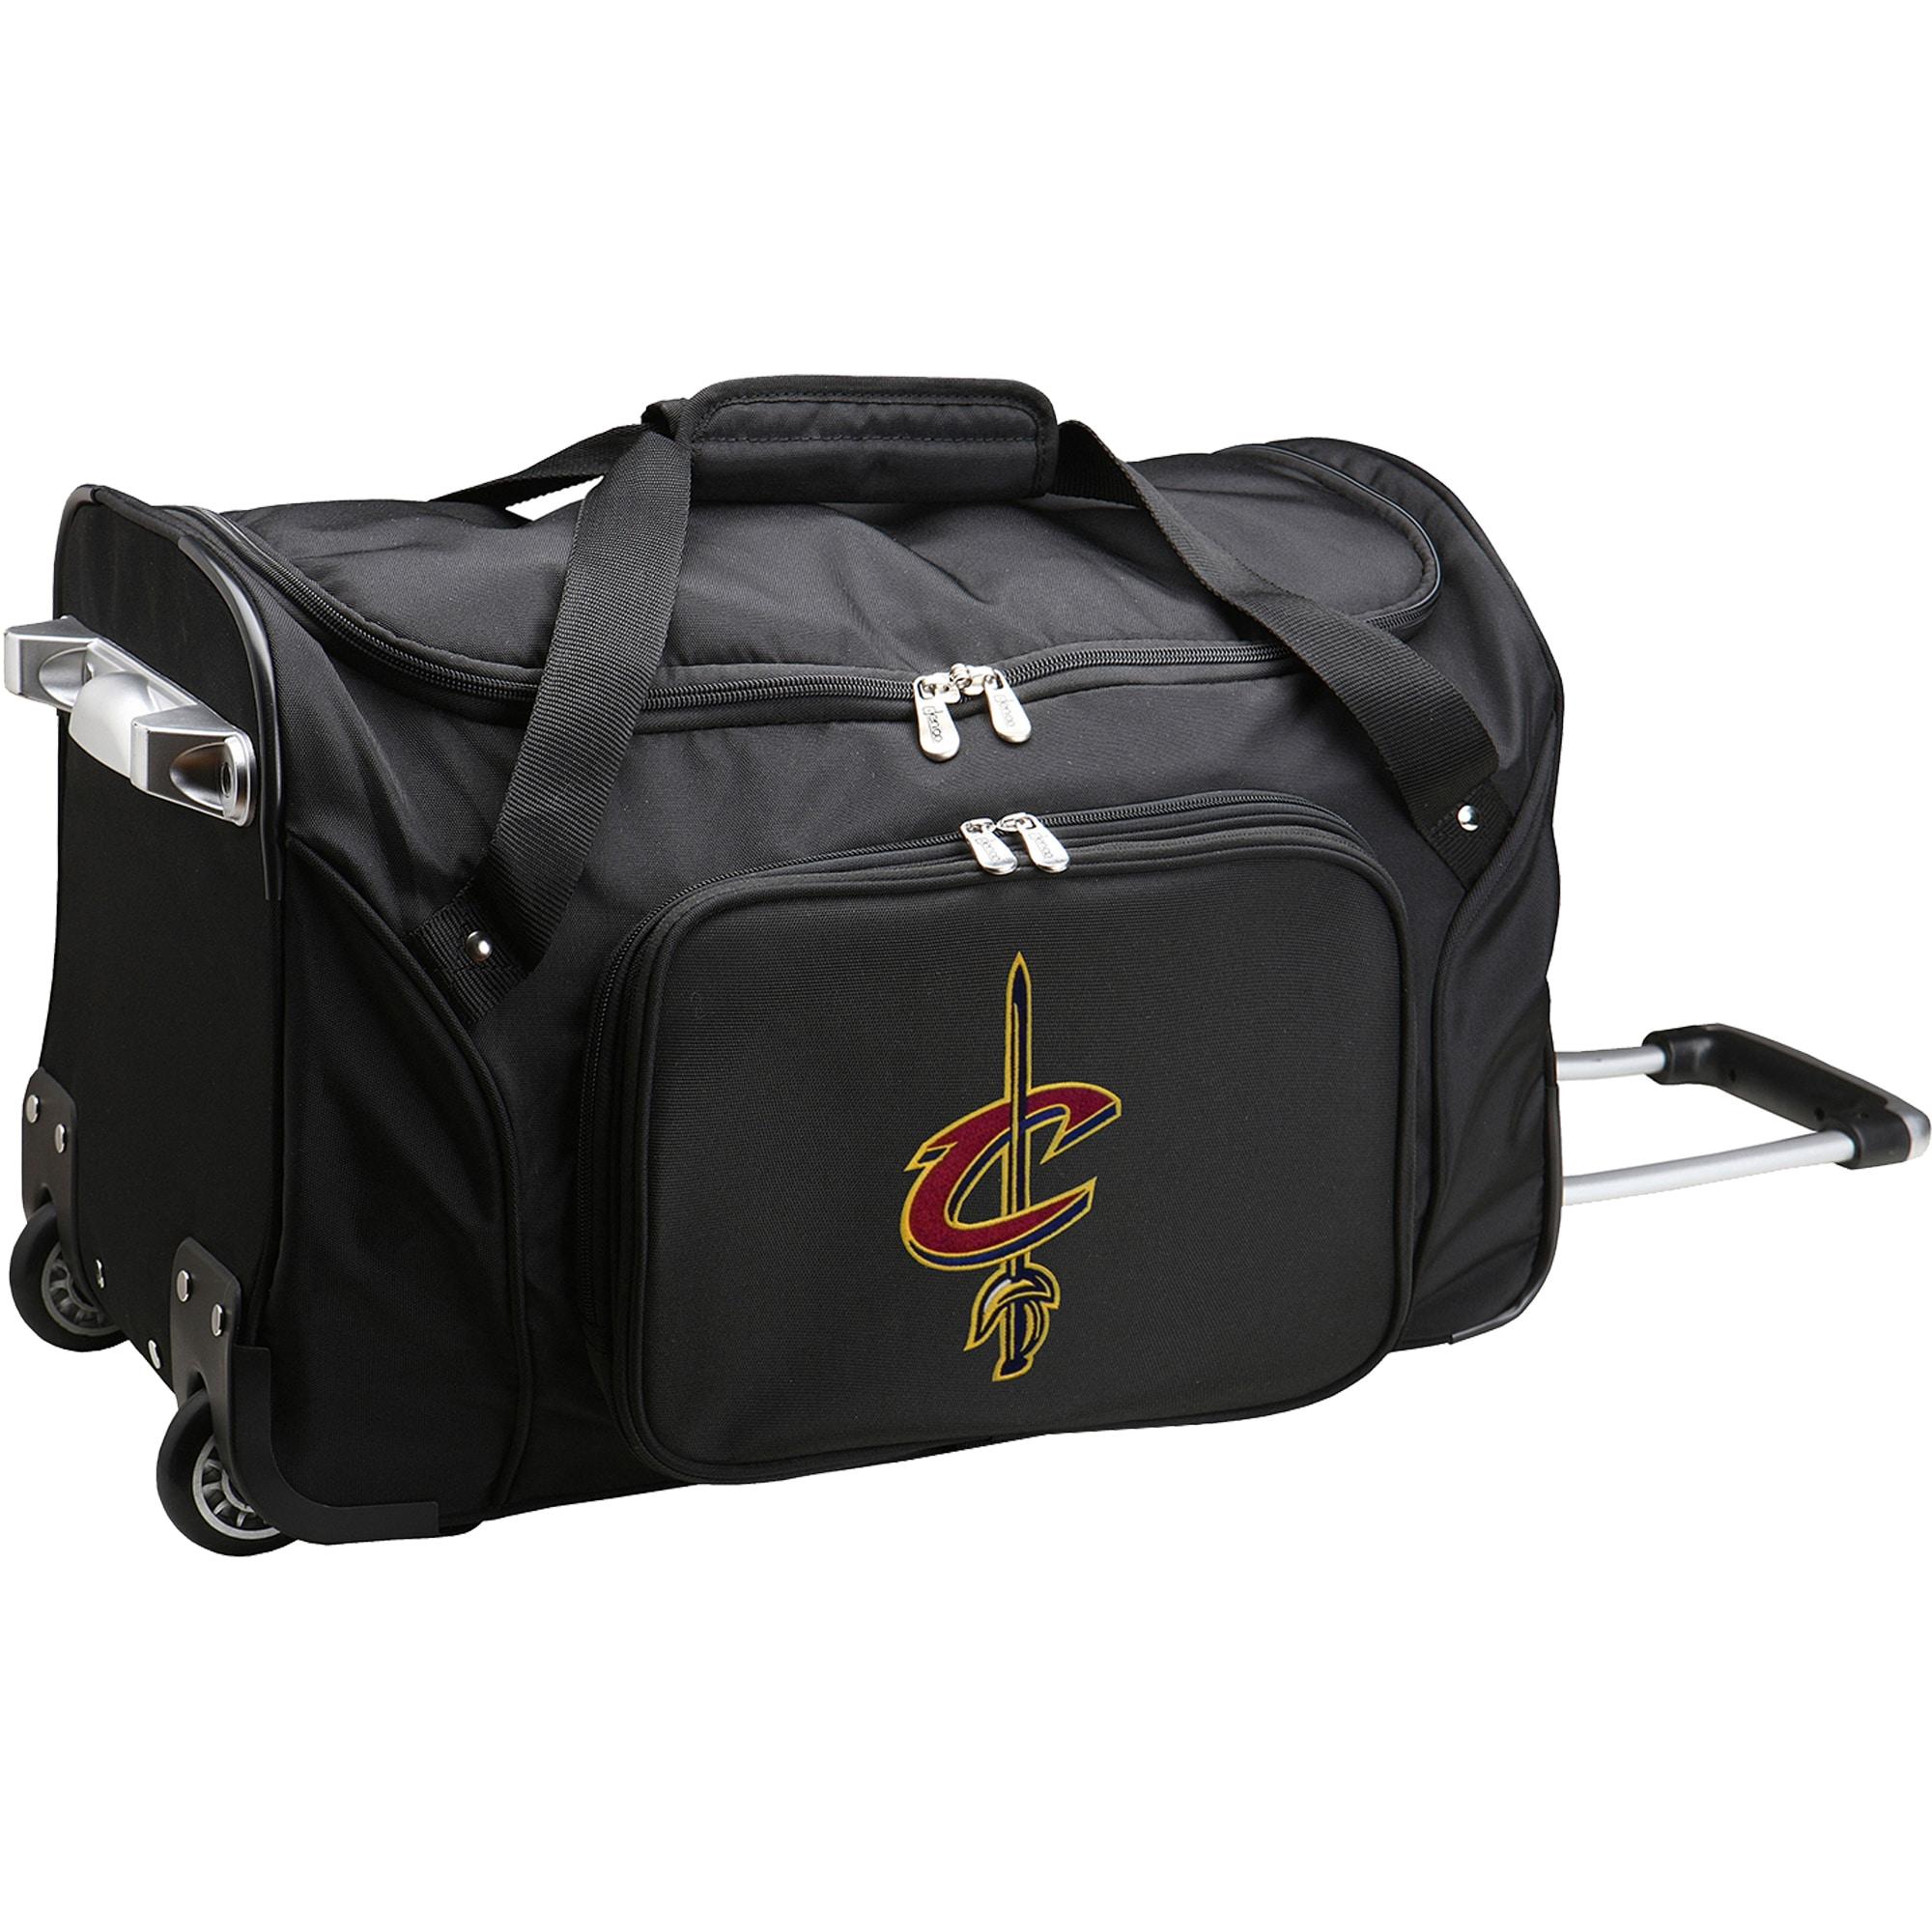 "Cleveland Cavaliers 22"" 2-Wheeled Duffel Bag - Black"